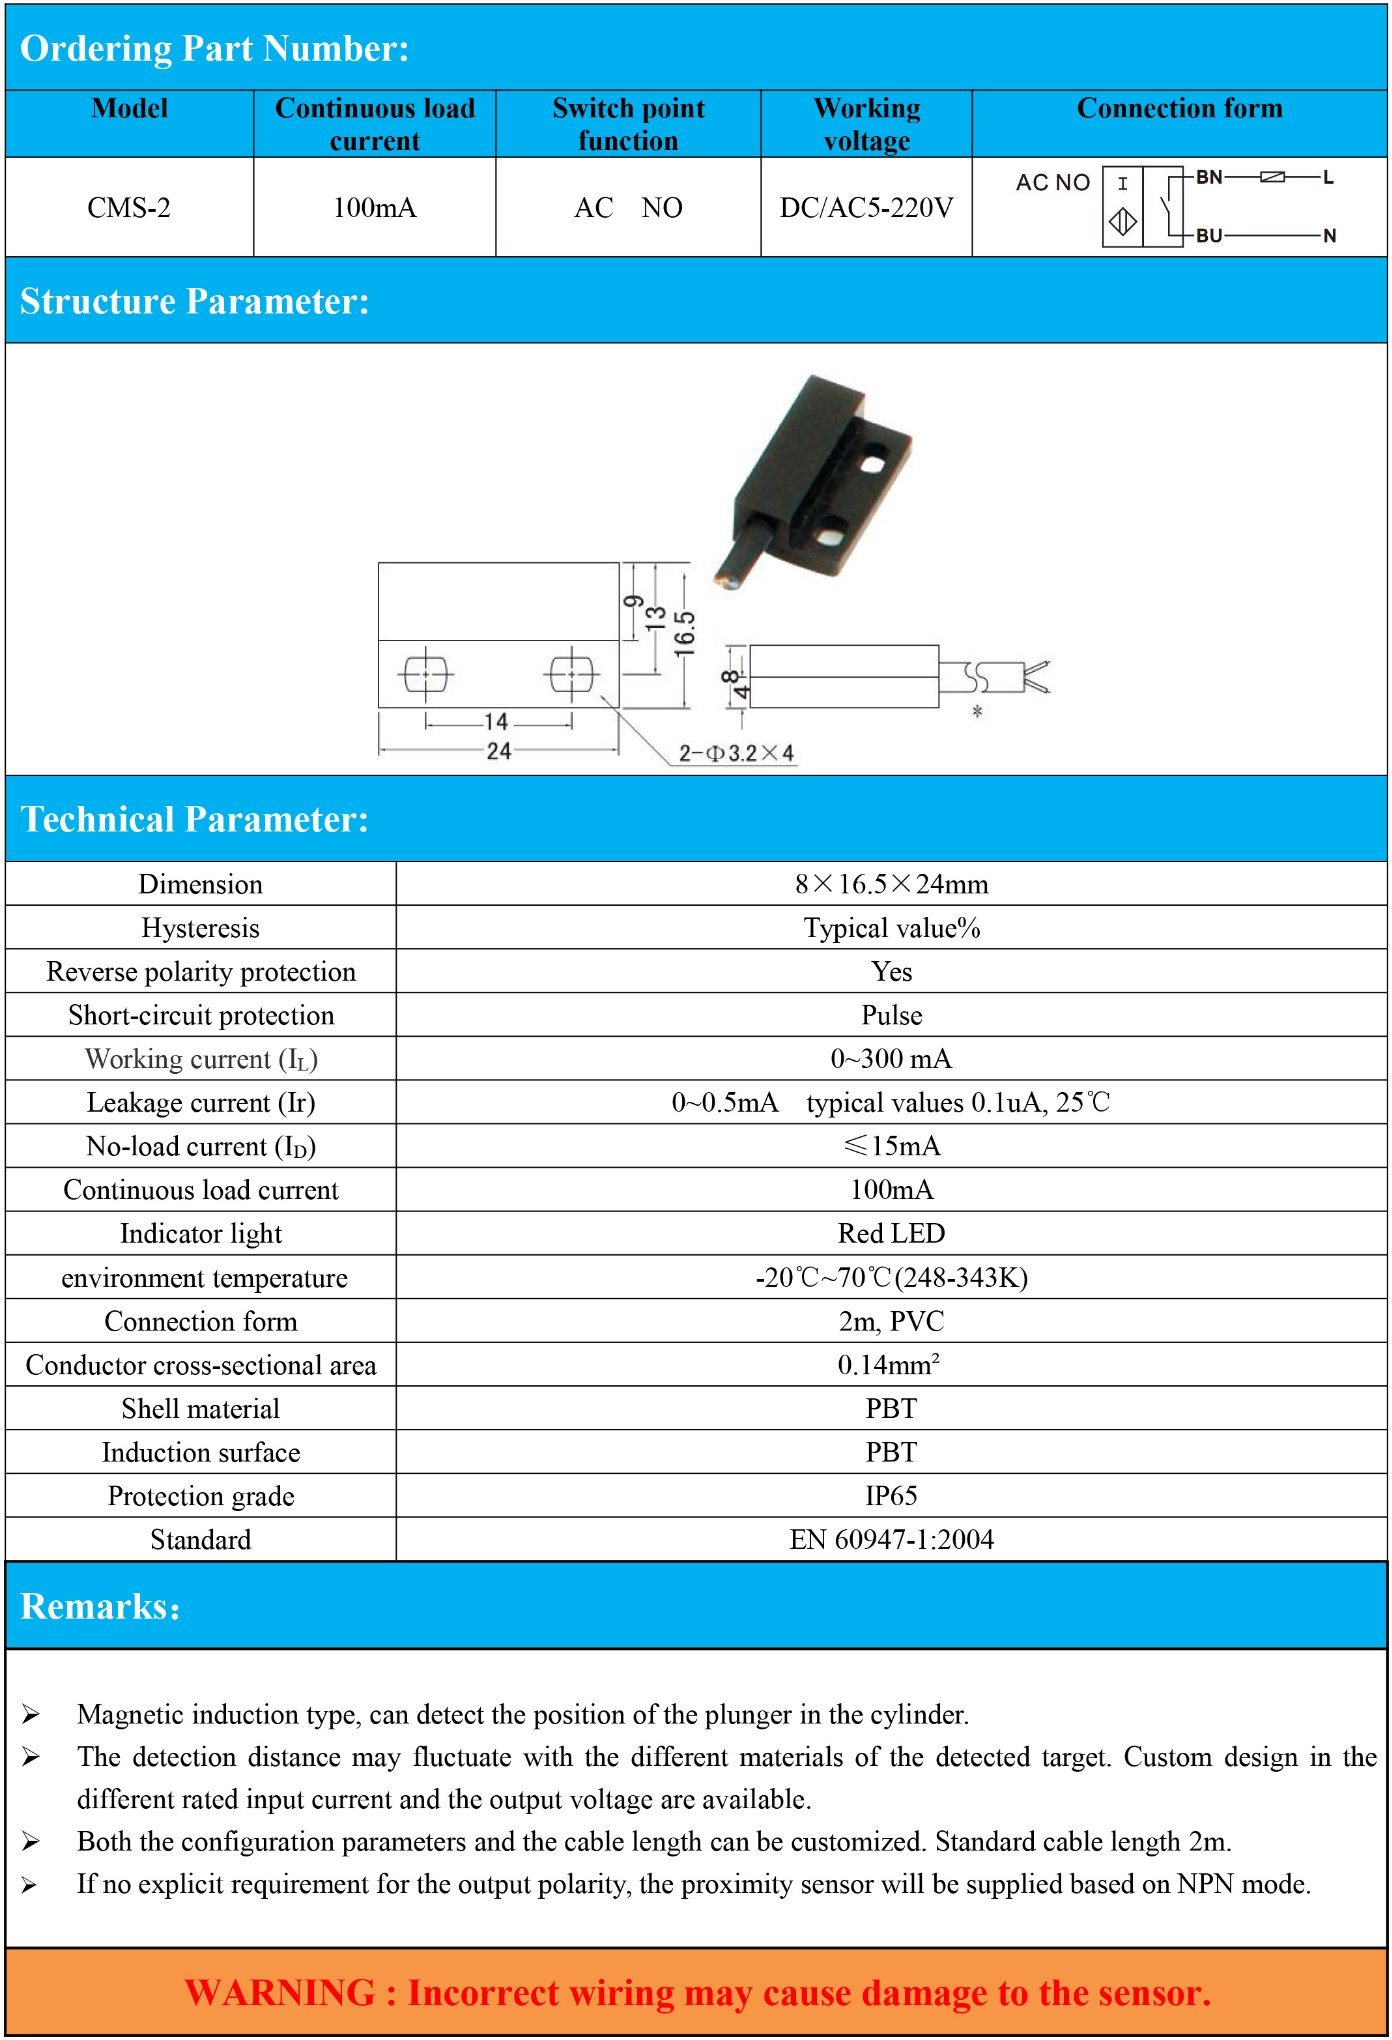 China Magnetic Proximity Sensor Switches AC No DC/AC 5-220V Photos ...